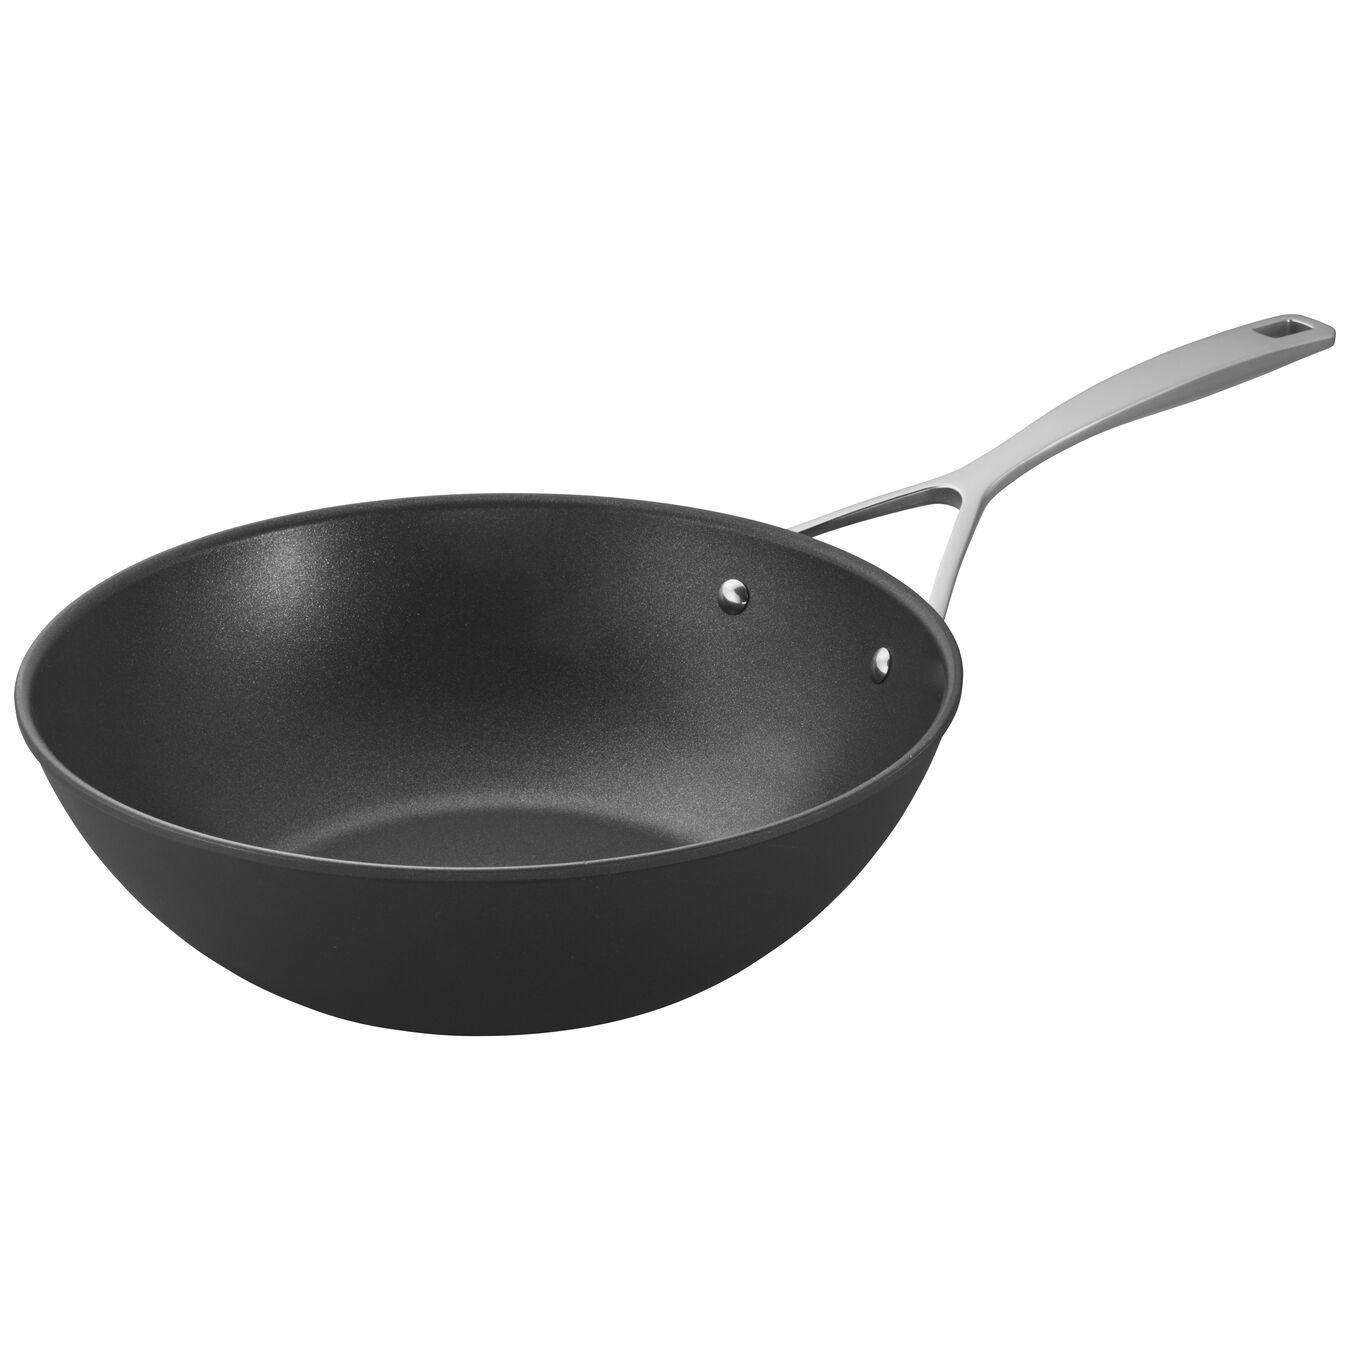 30 cm / 12 inch Aluminum Wok without lid,,large 2